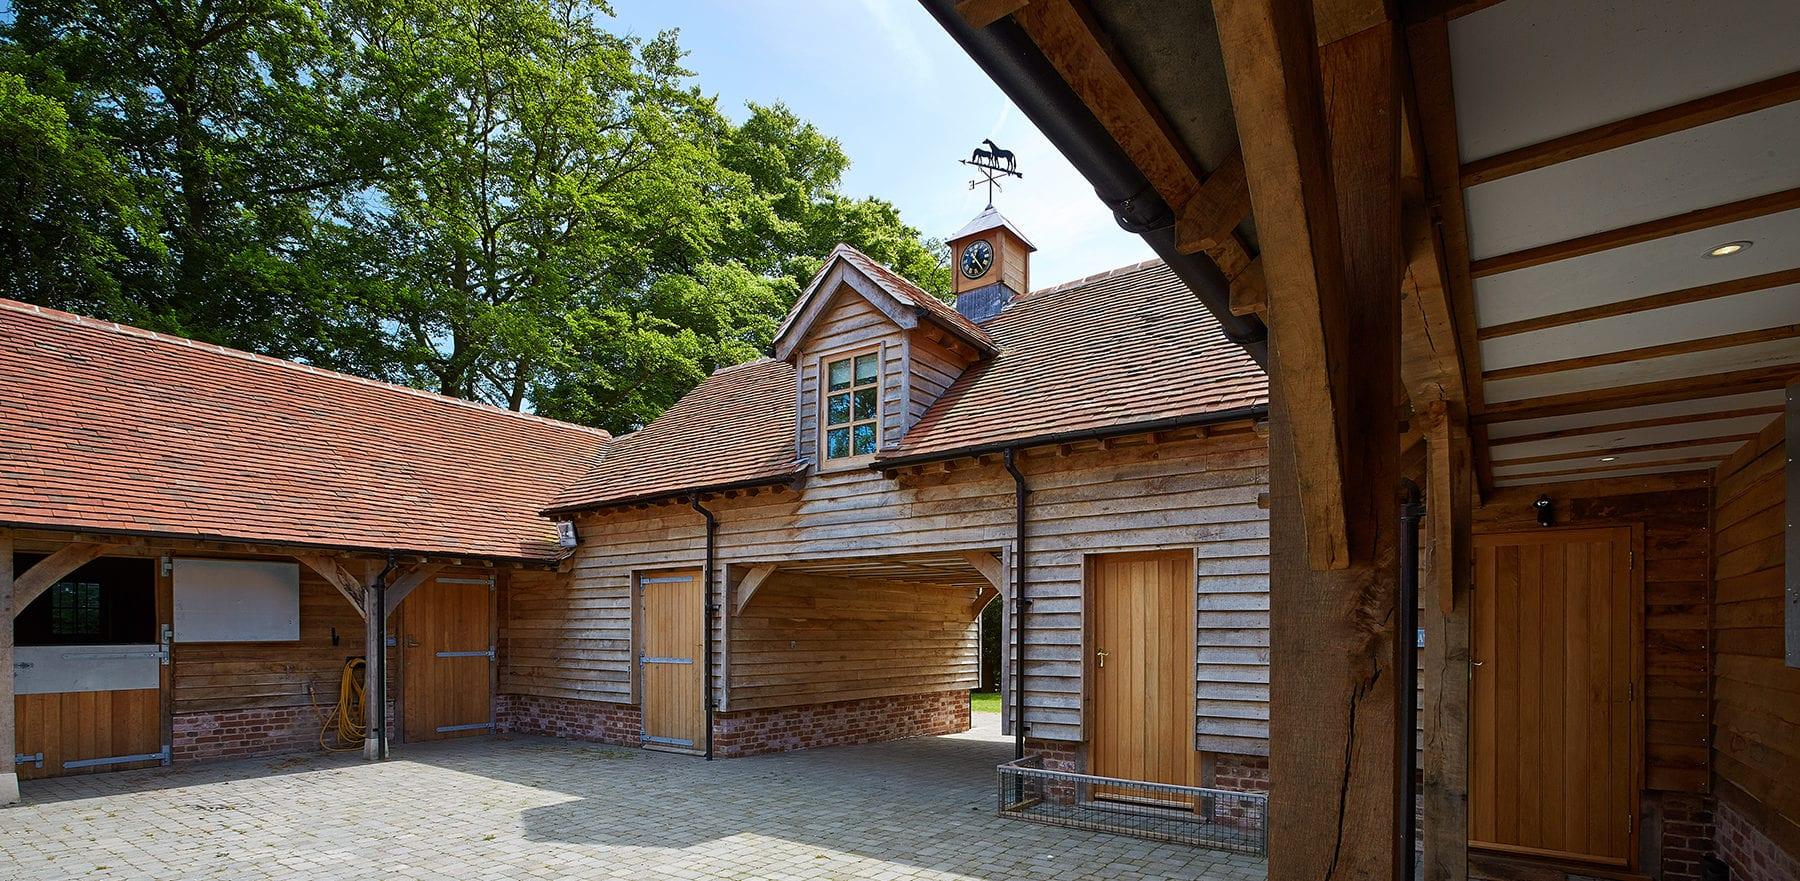 Lifestiles - Handmade Bespoke Clay Roof Tiles - Ascot, England 7